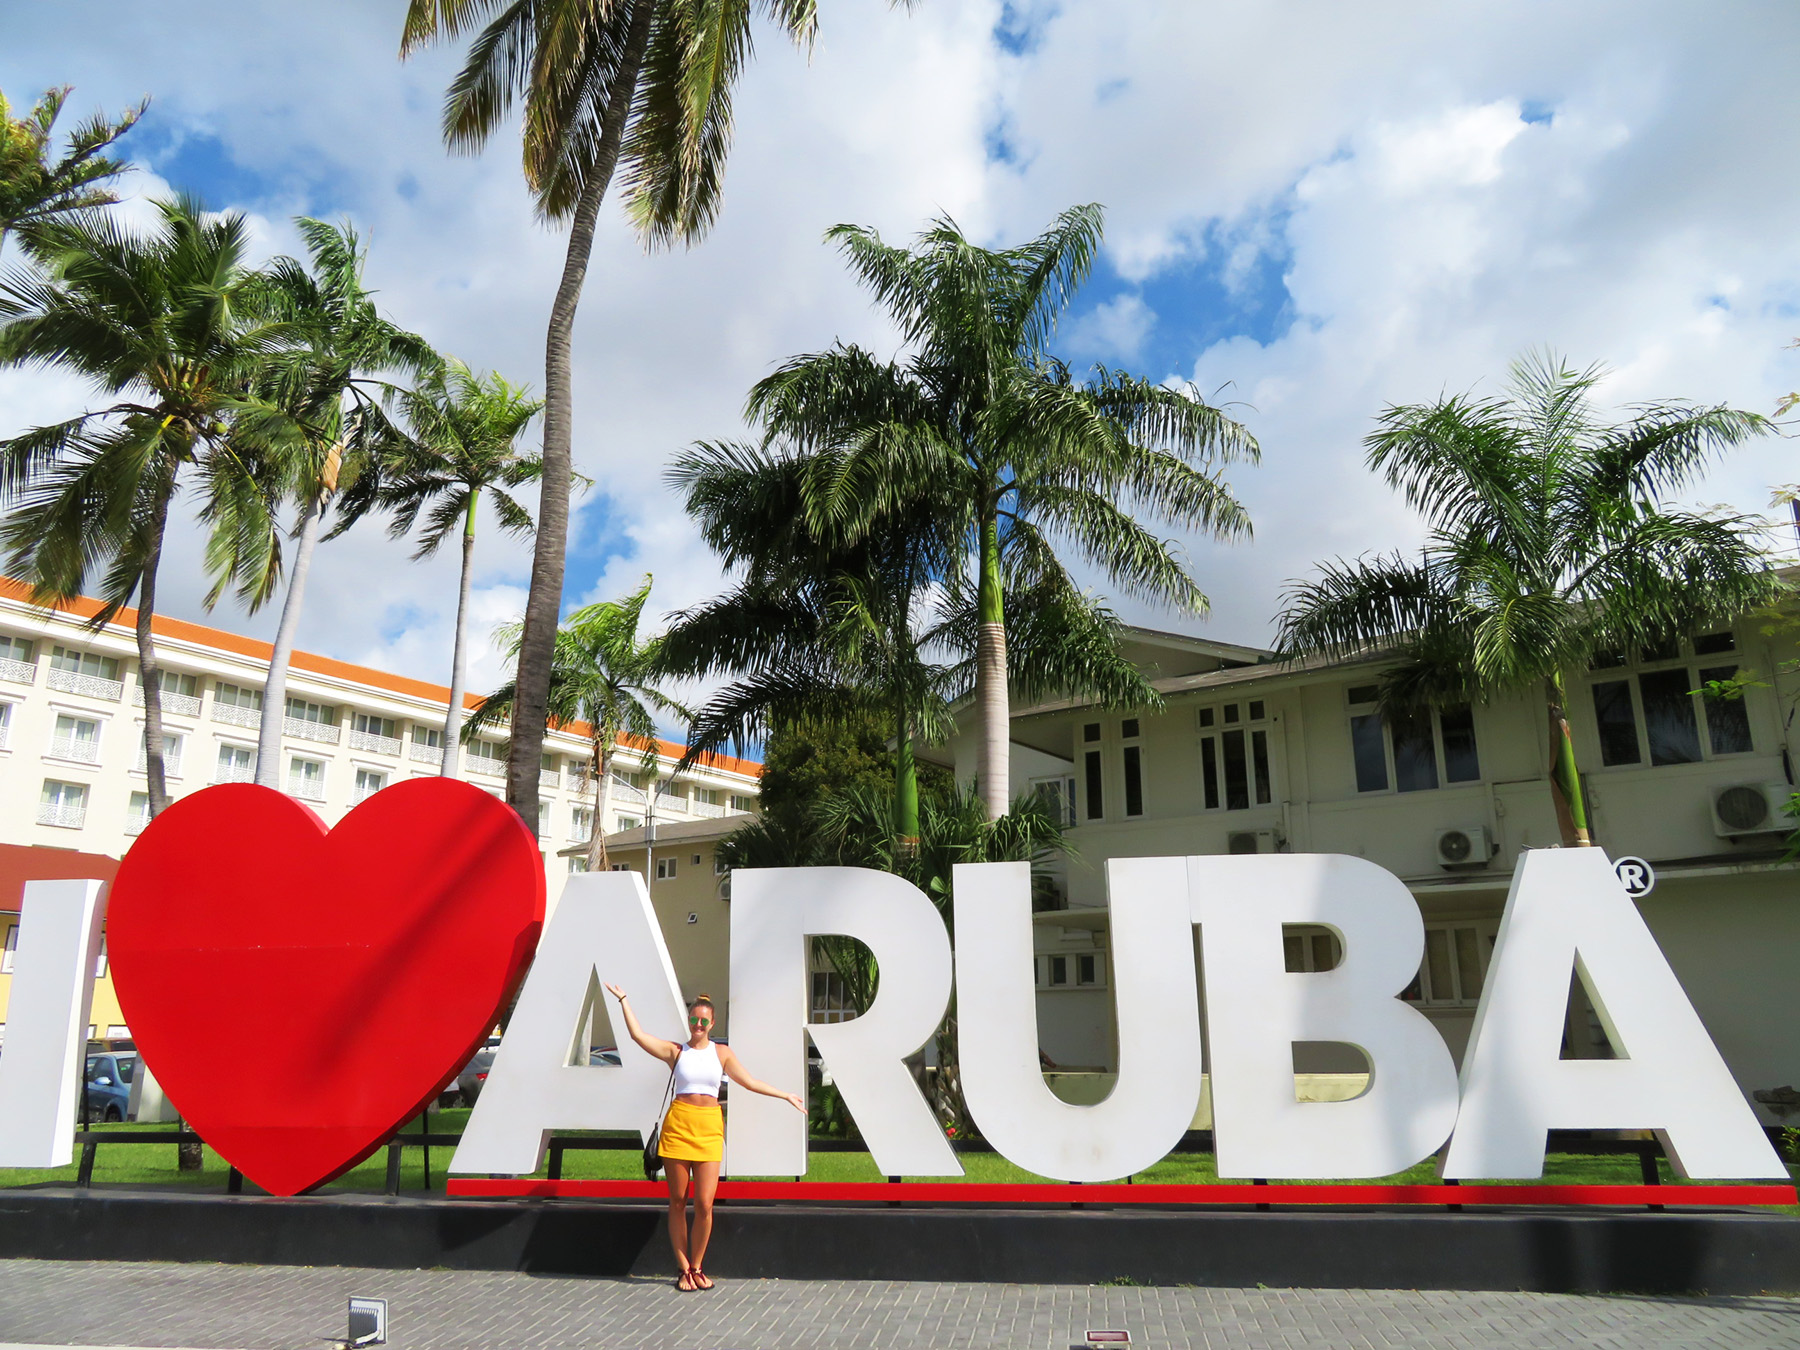 Karibik Kreuzfahrt I love Aruba Sign